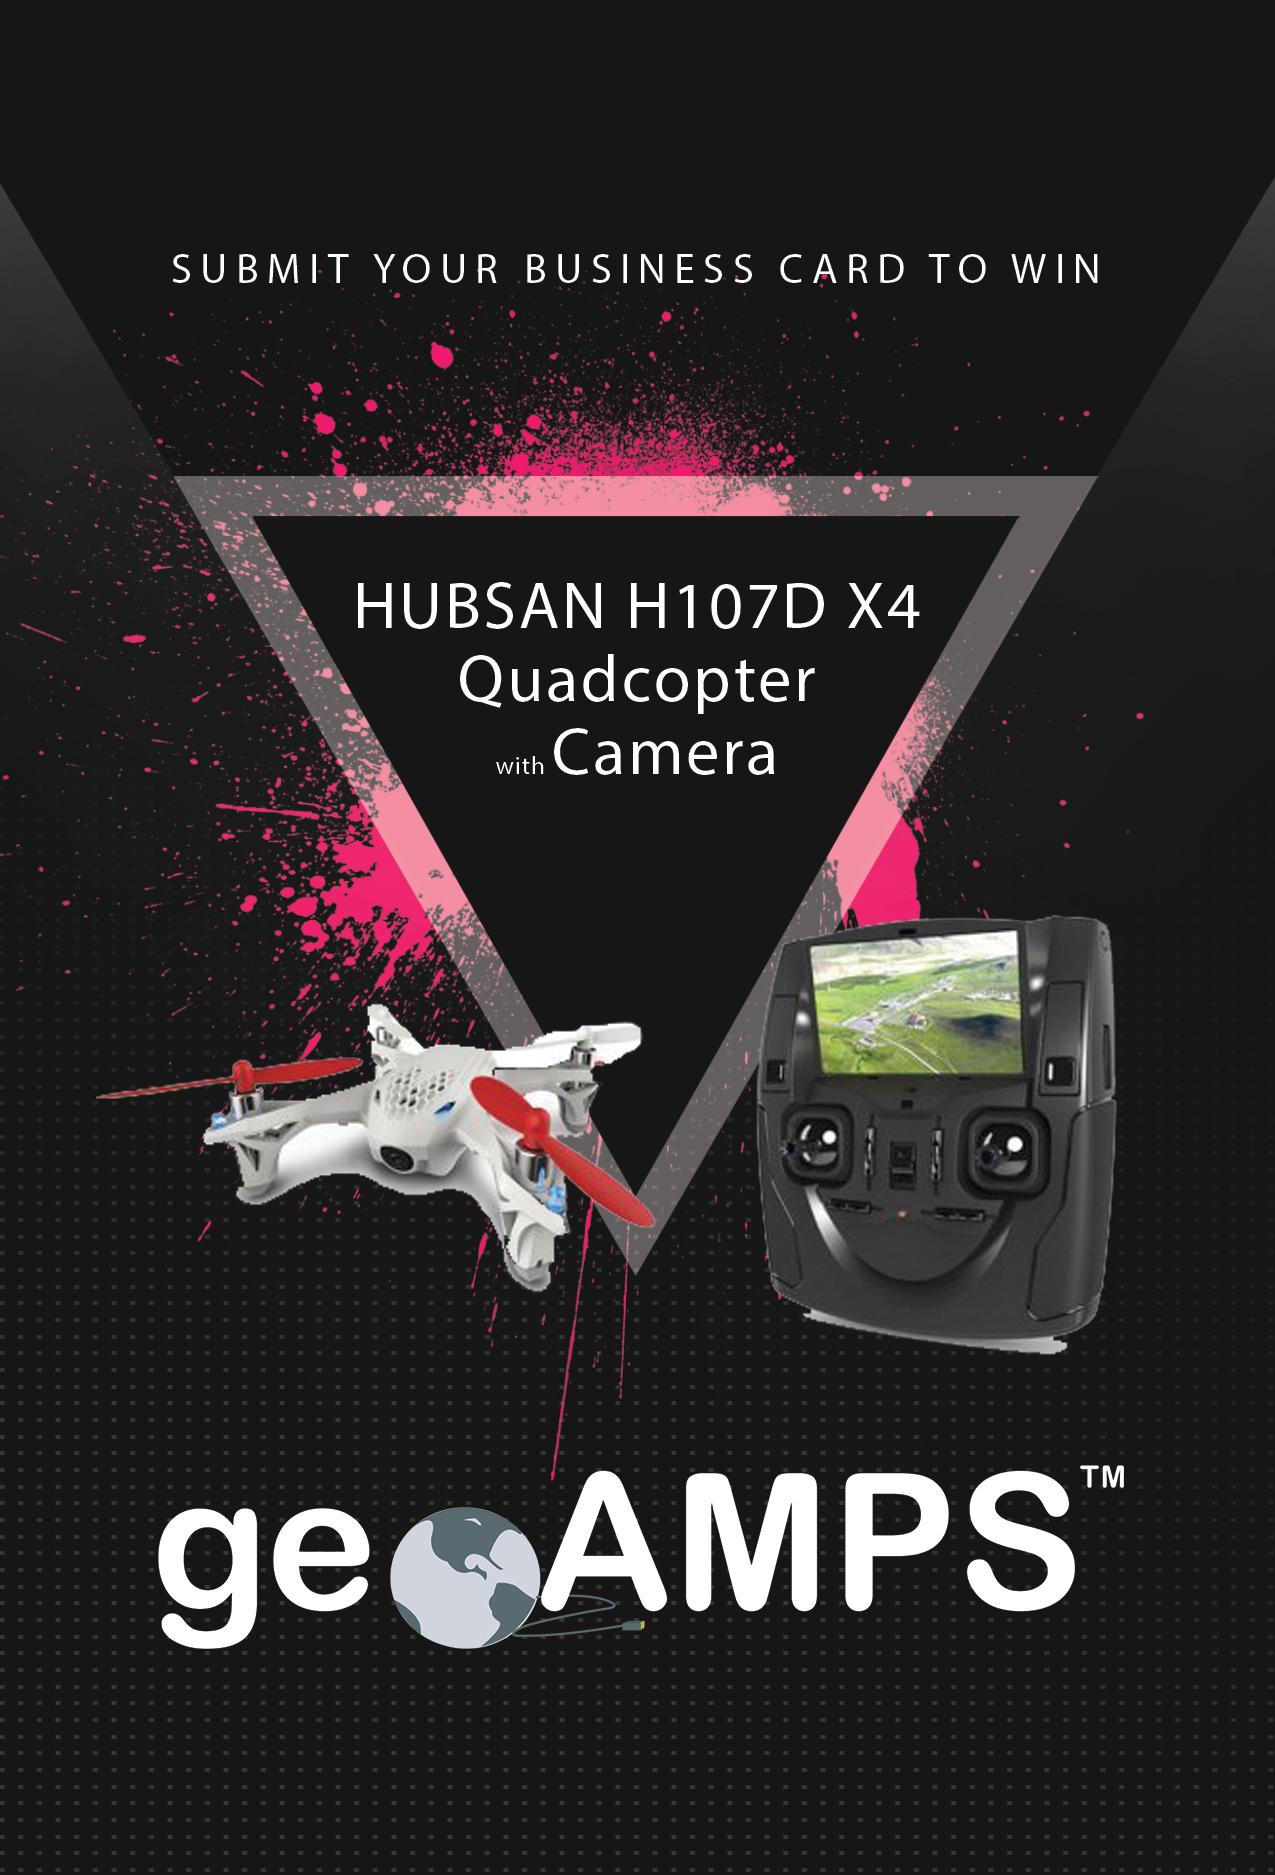 geoamps-irwa-drone-flyer-01.png